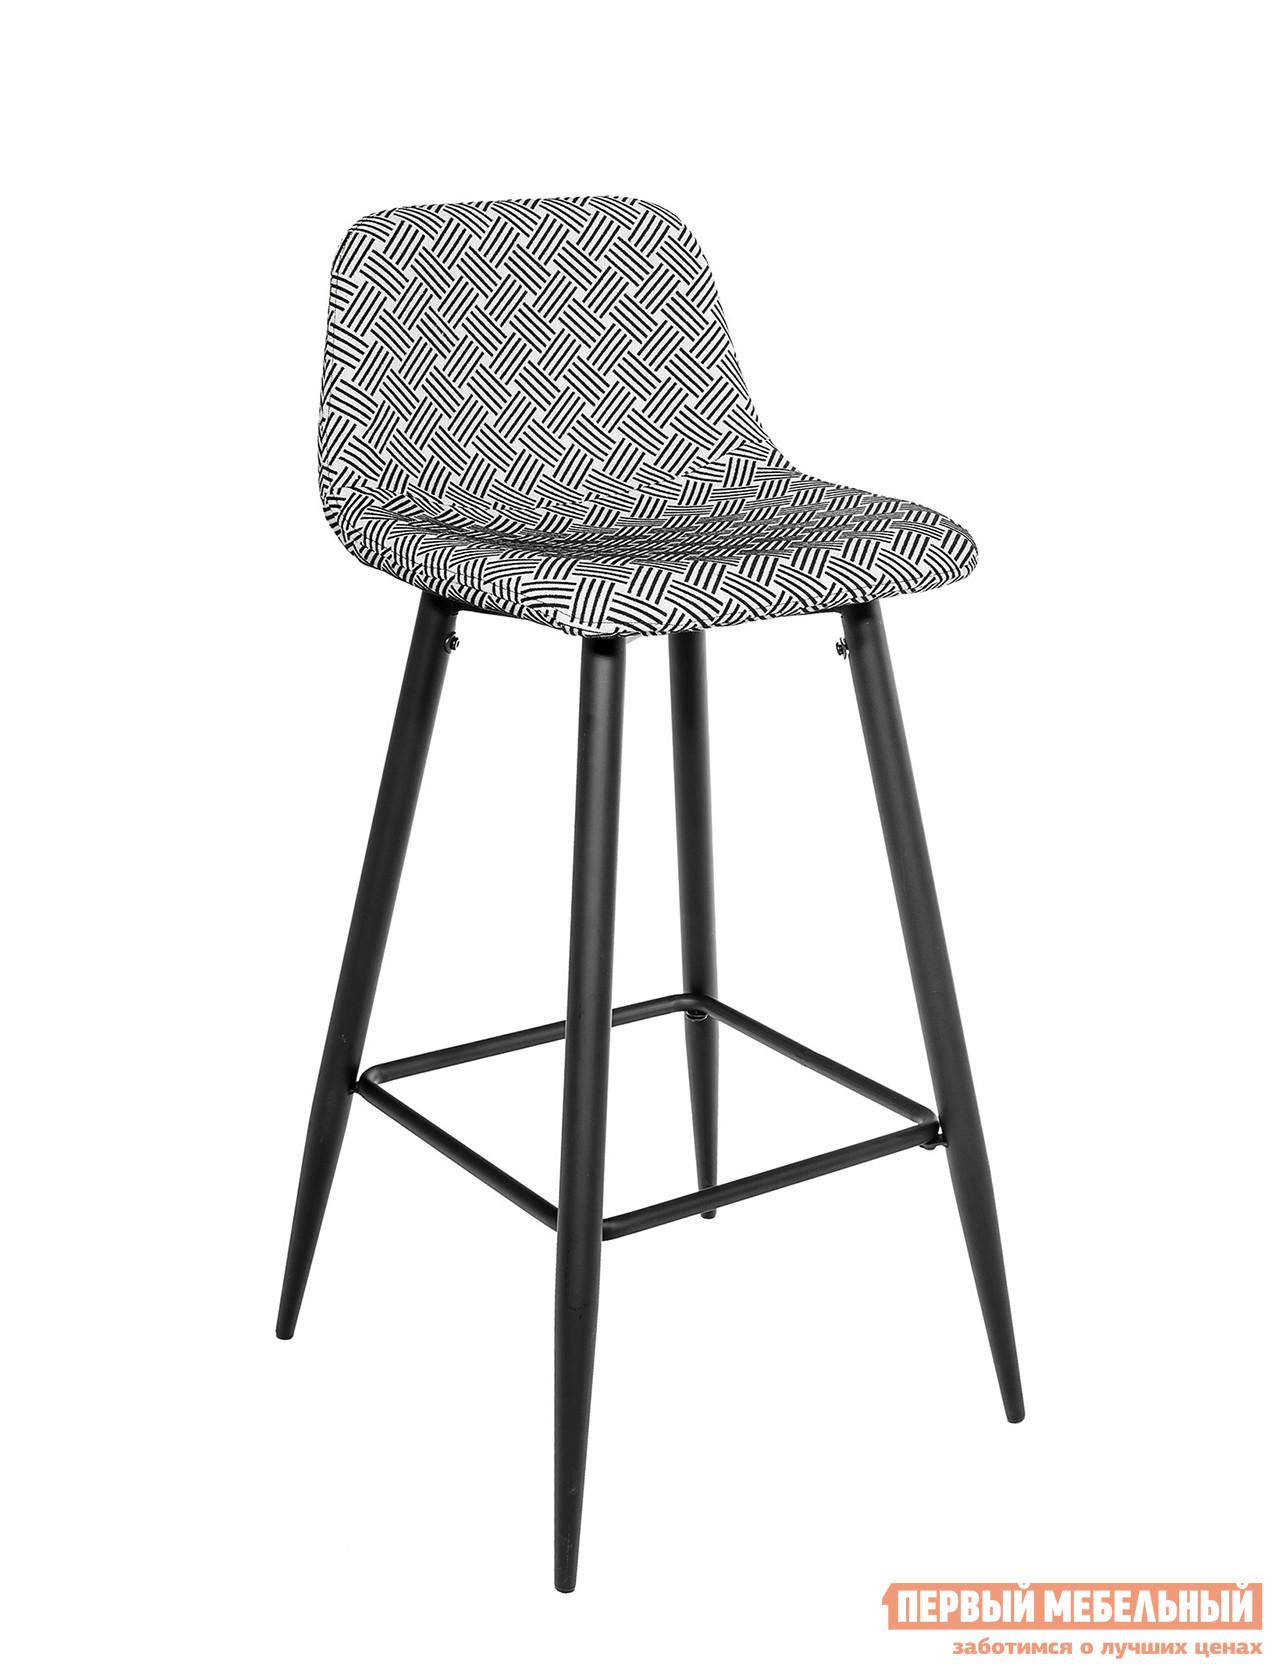 Барный стул STOOL GROUP Бартон Черно-белый принт от Купистол